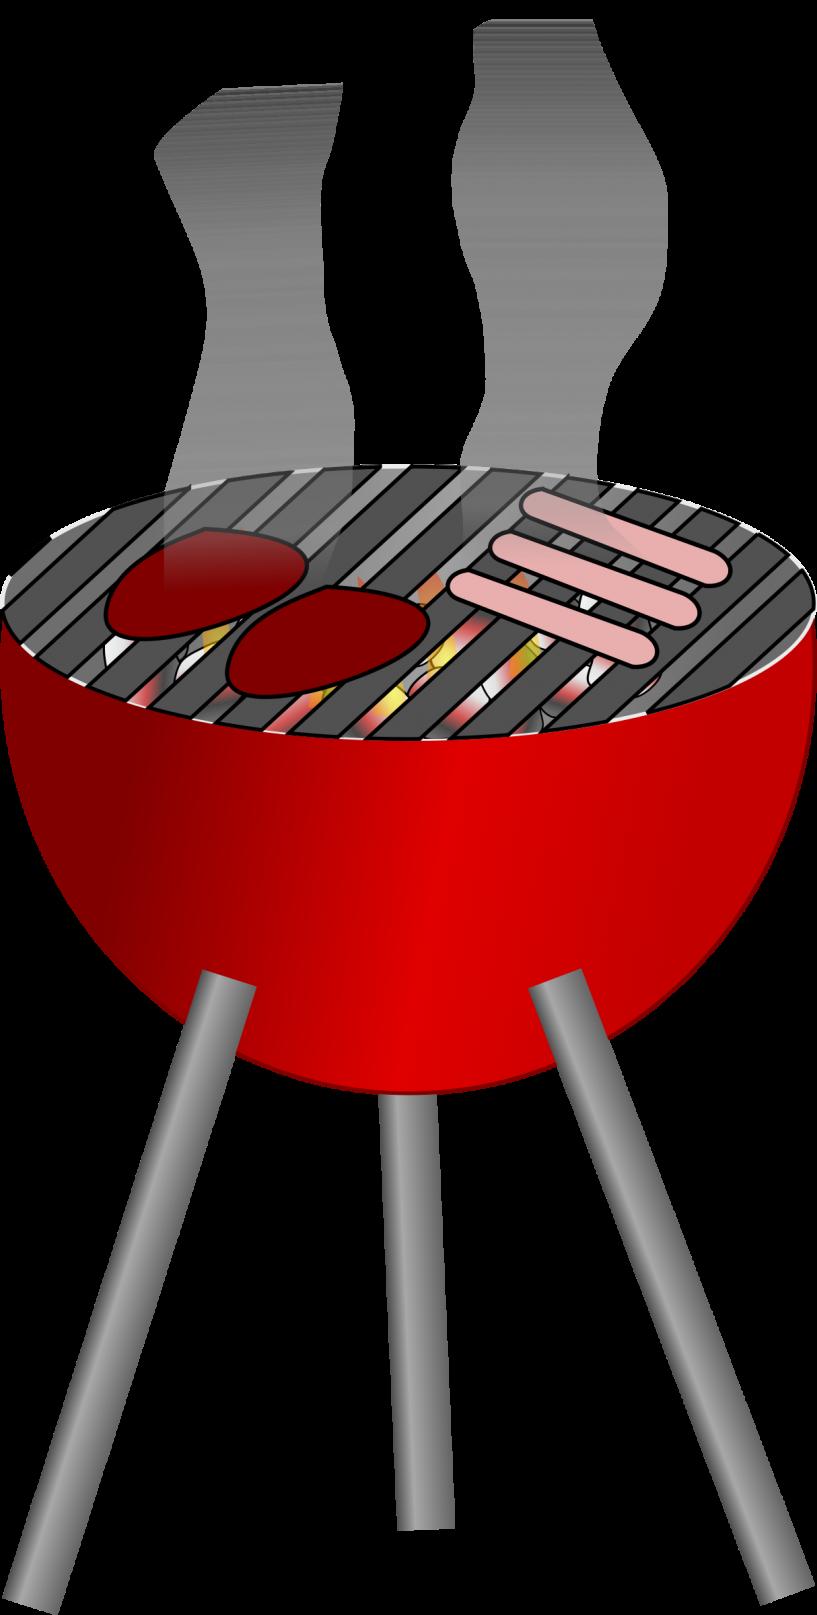 Grilling clipart hot dog grill. Bbq jokingart com